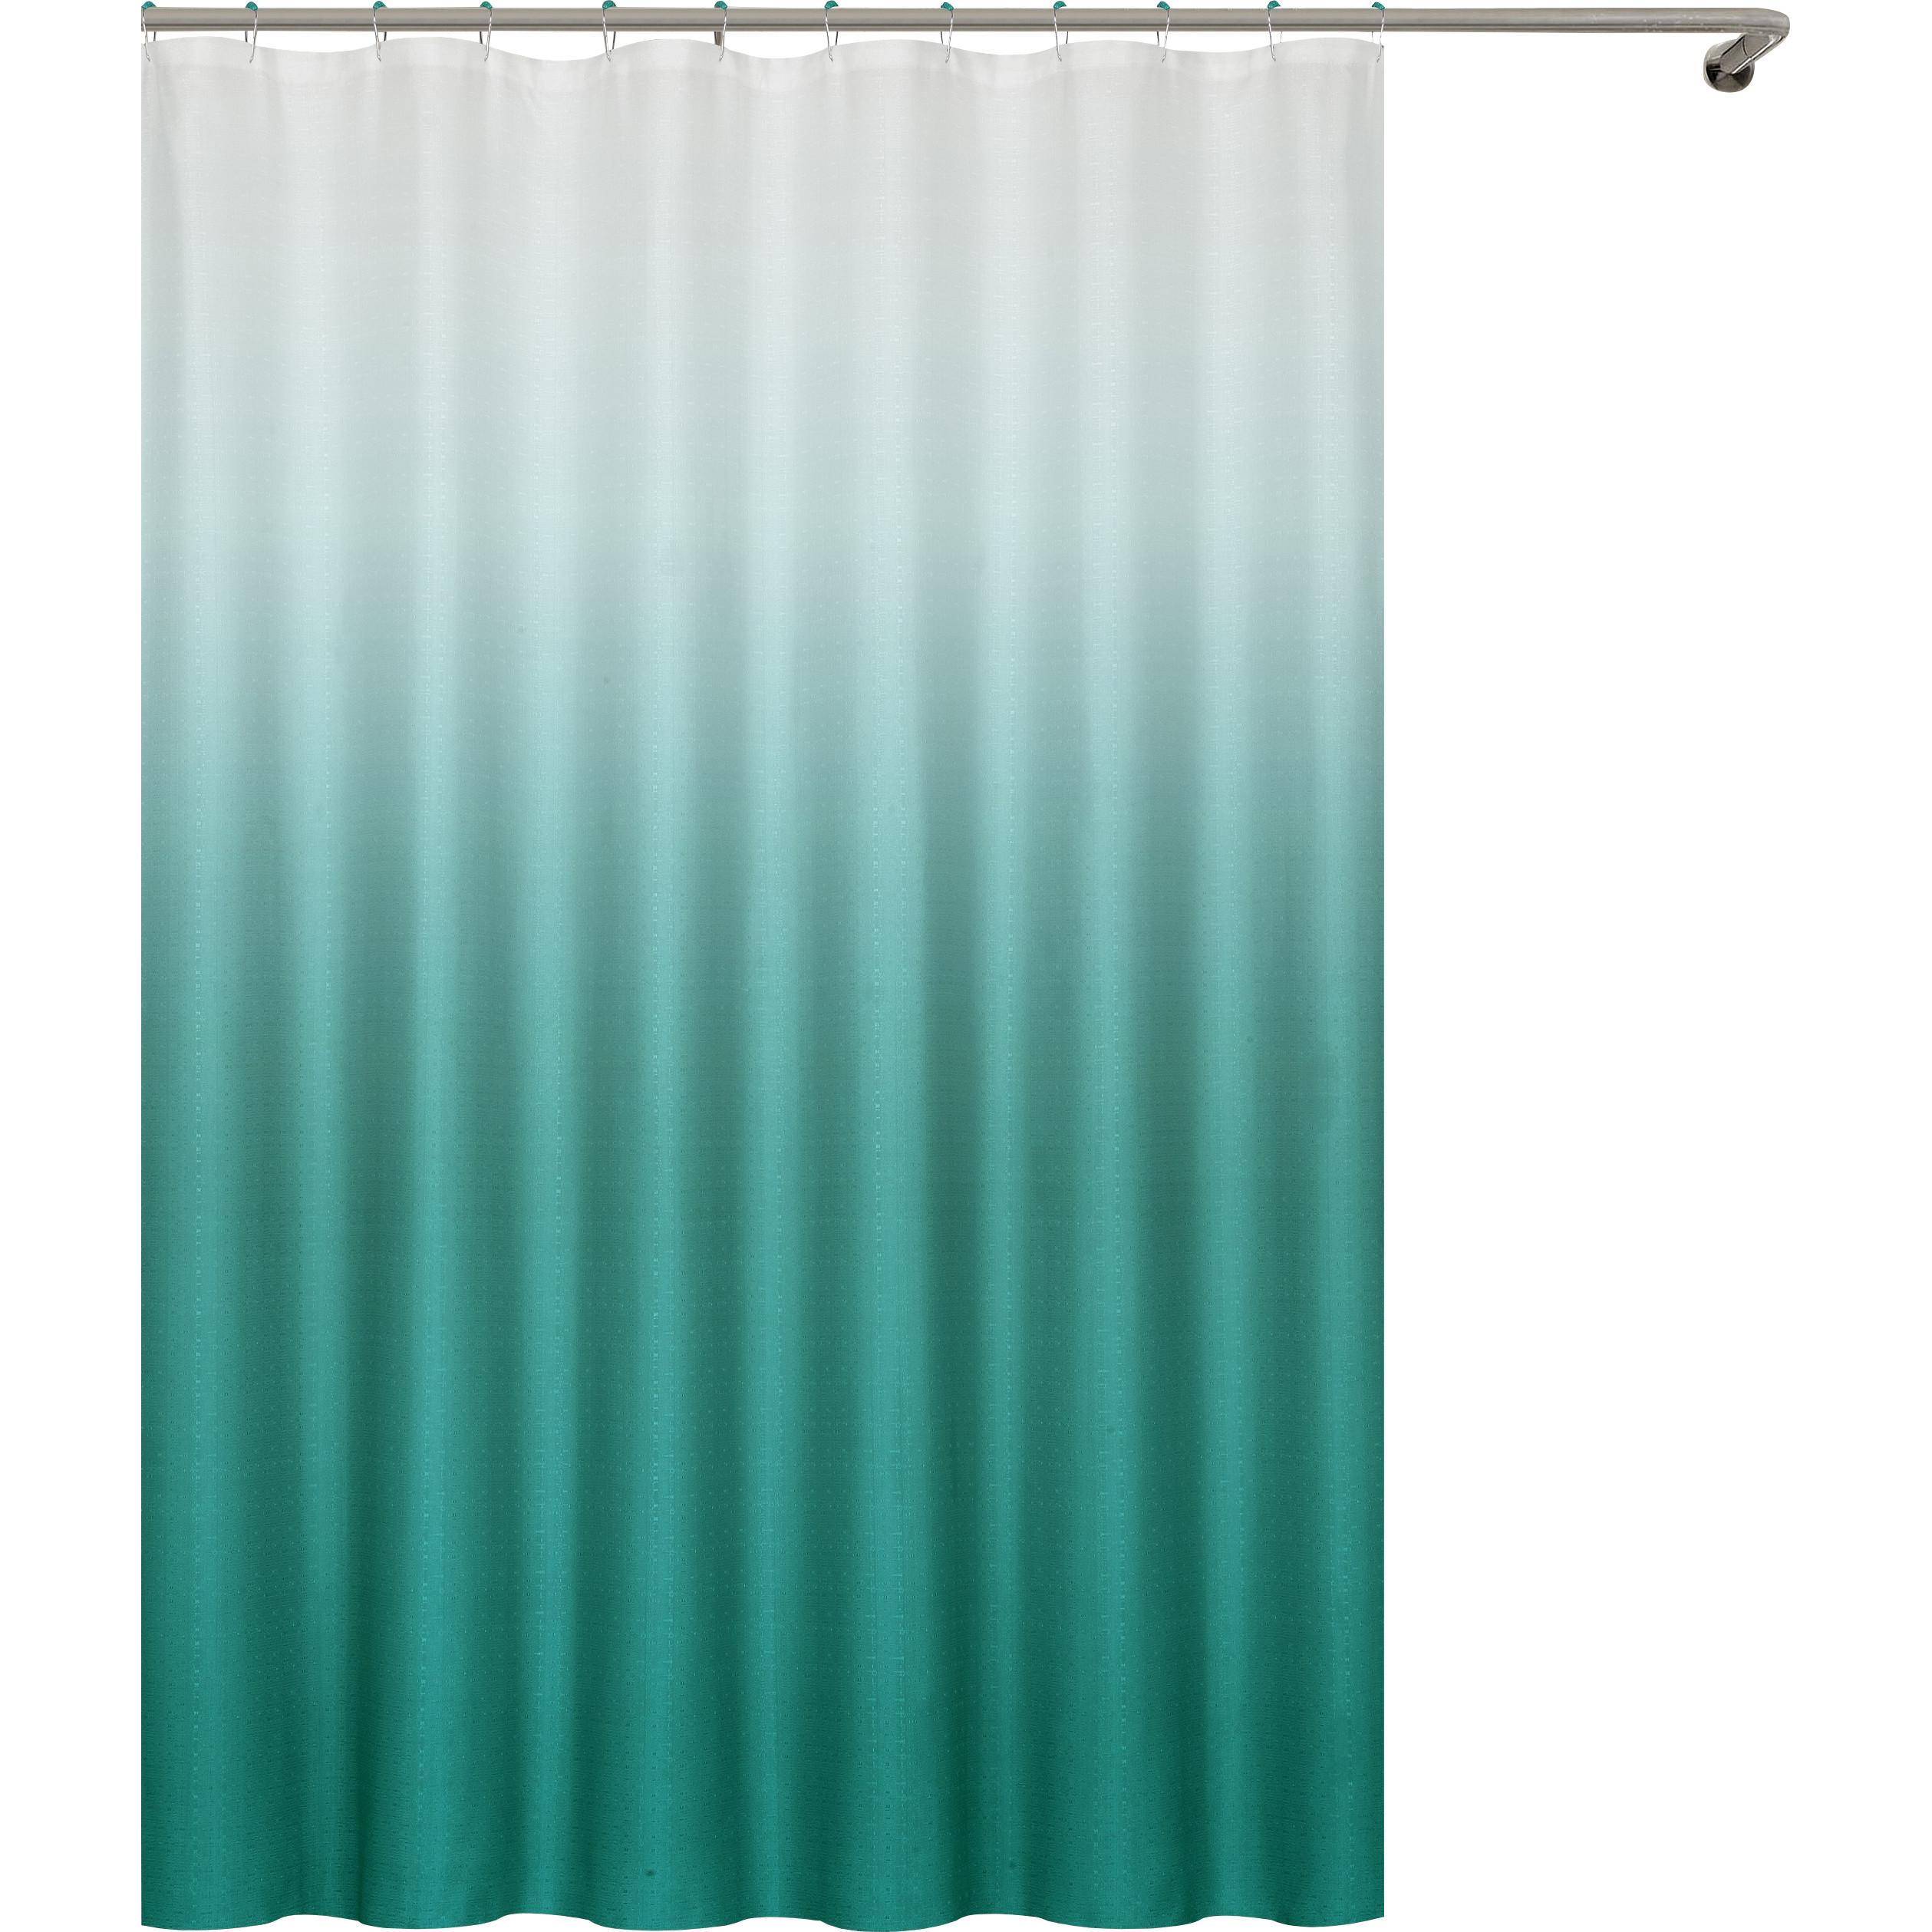 spa bathroom shower curtains photo - 4